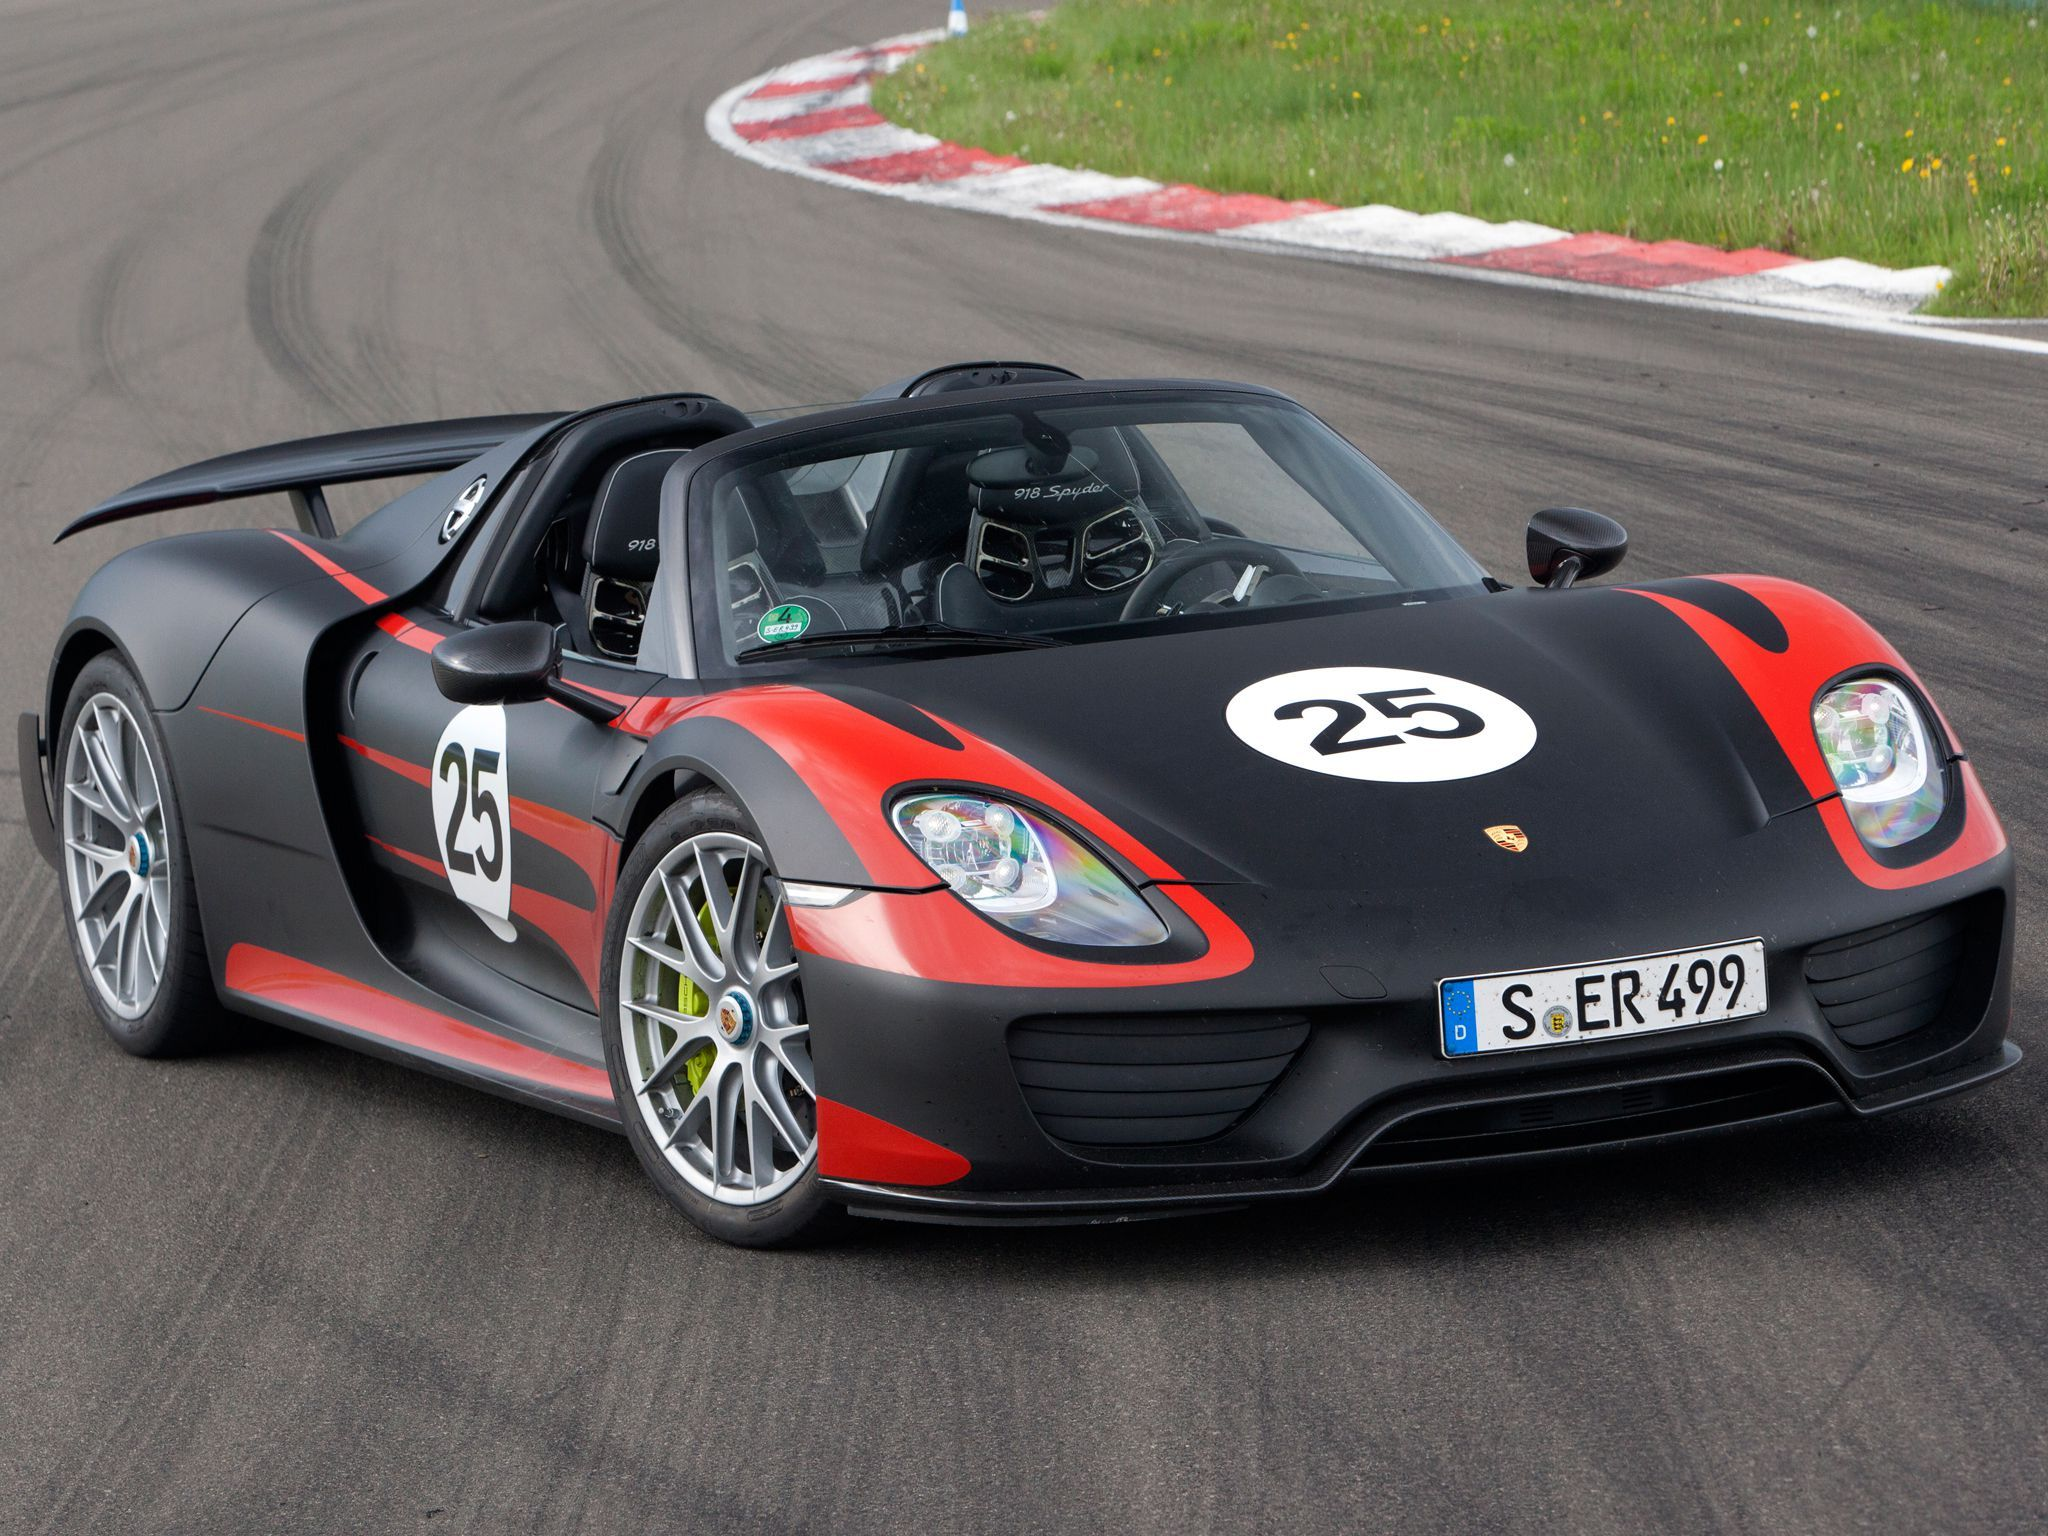 cb590ca7b332409f01297d80af993c23 Extraordinary Porsche 918 Spyder Weissach Package Precio Cars Trend